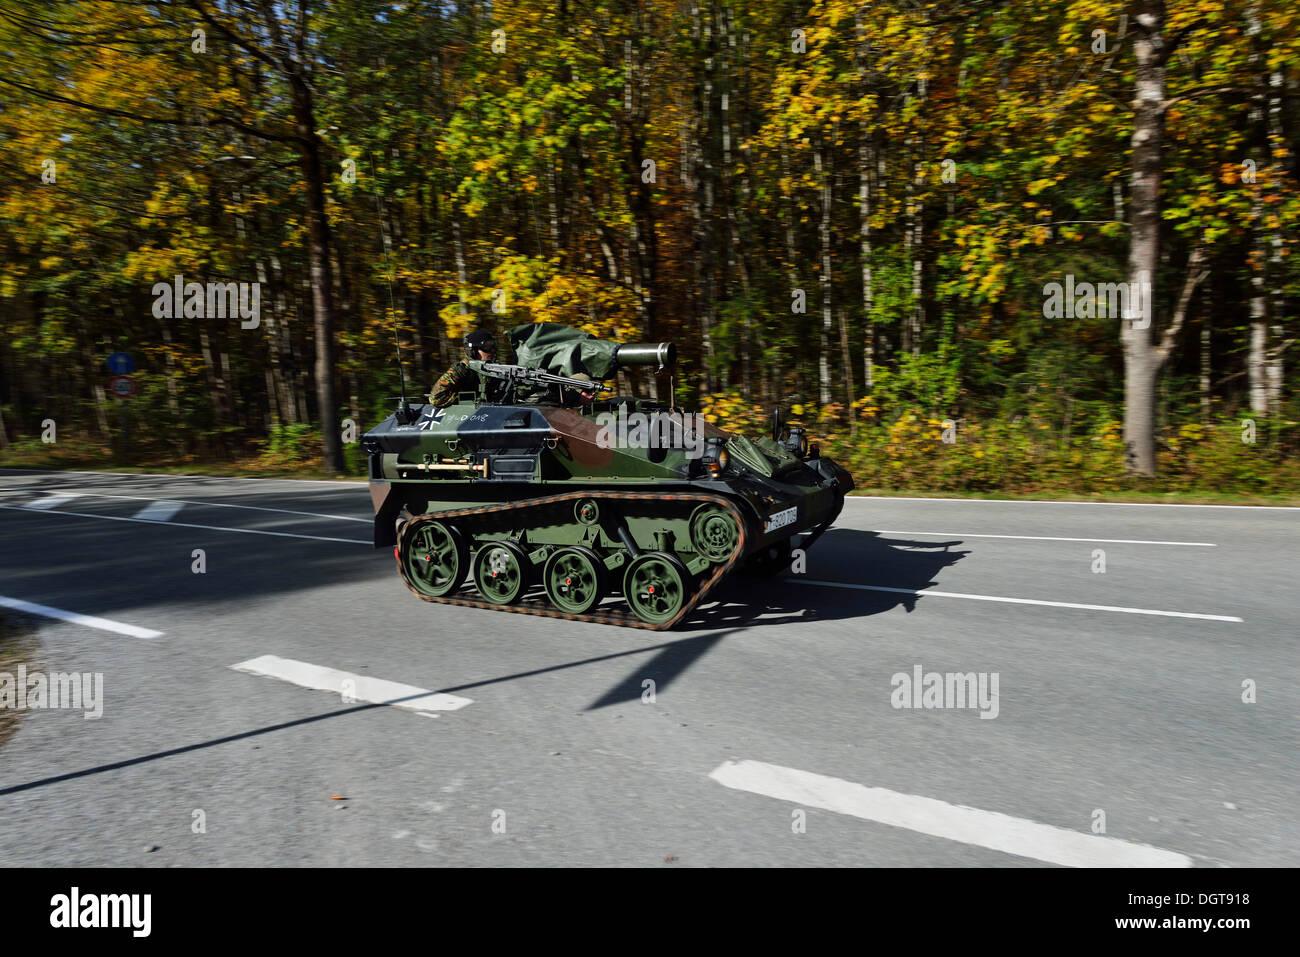 Tanks of the mountain infantry during a manoeuvre, Reit im Winkl, Chiemgau region, Upper Bavaria, Bavaria - Stock Image